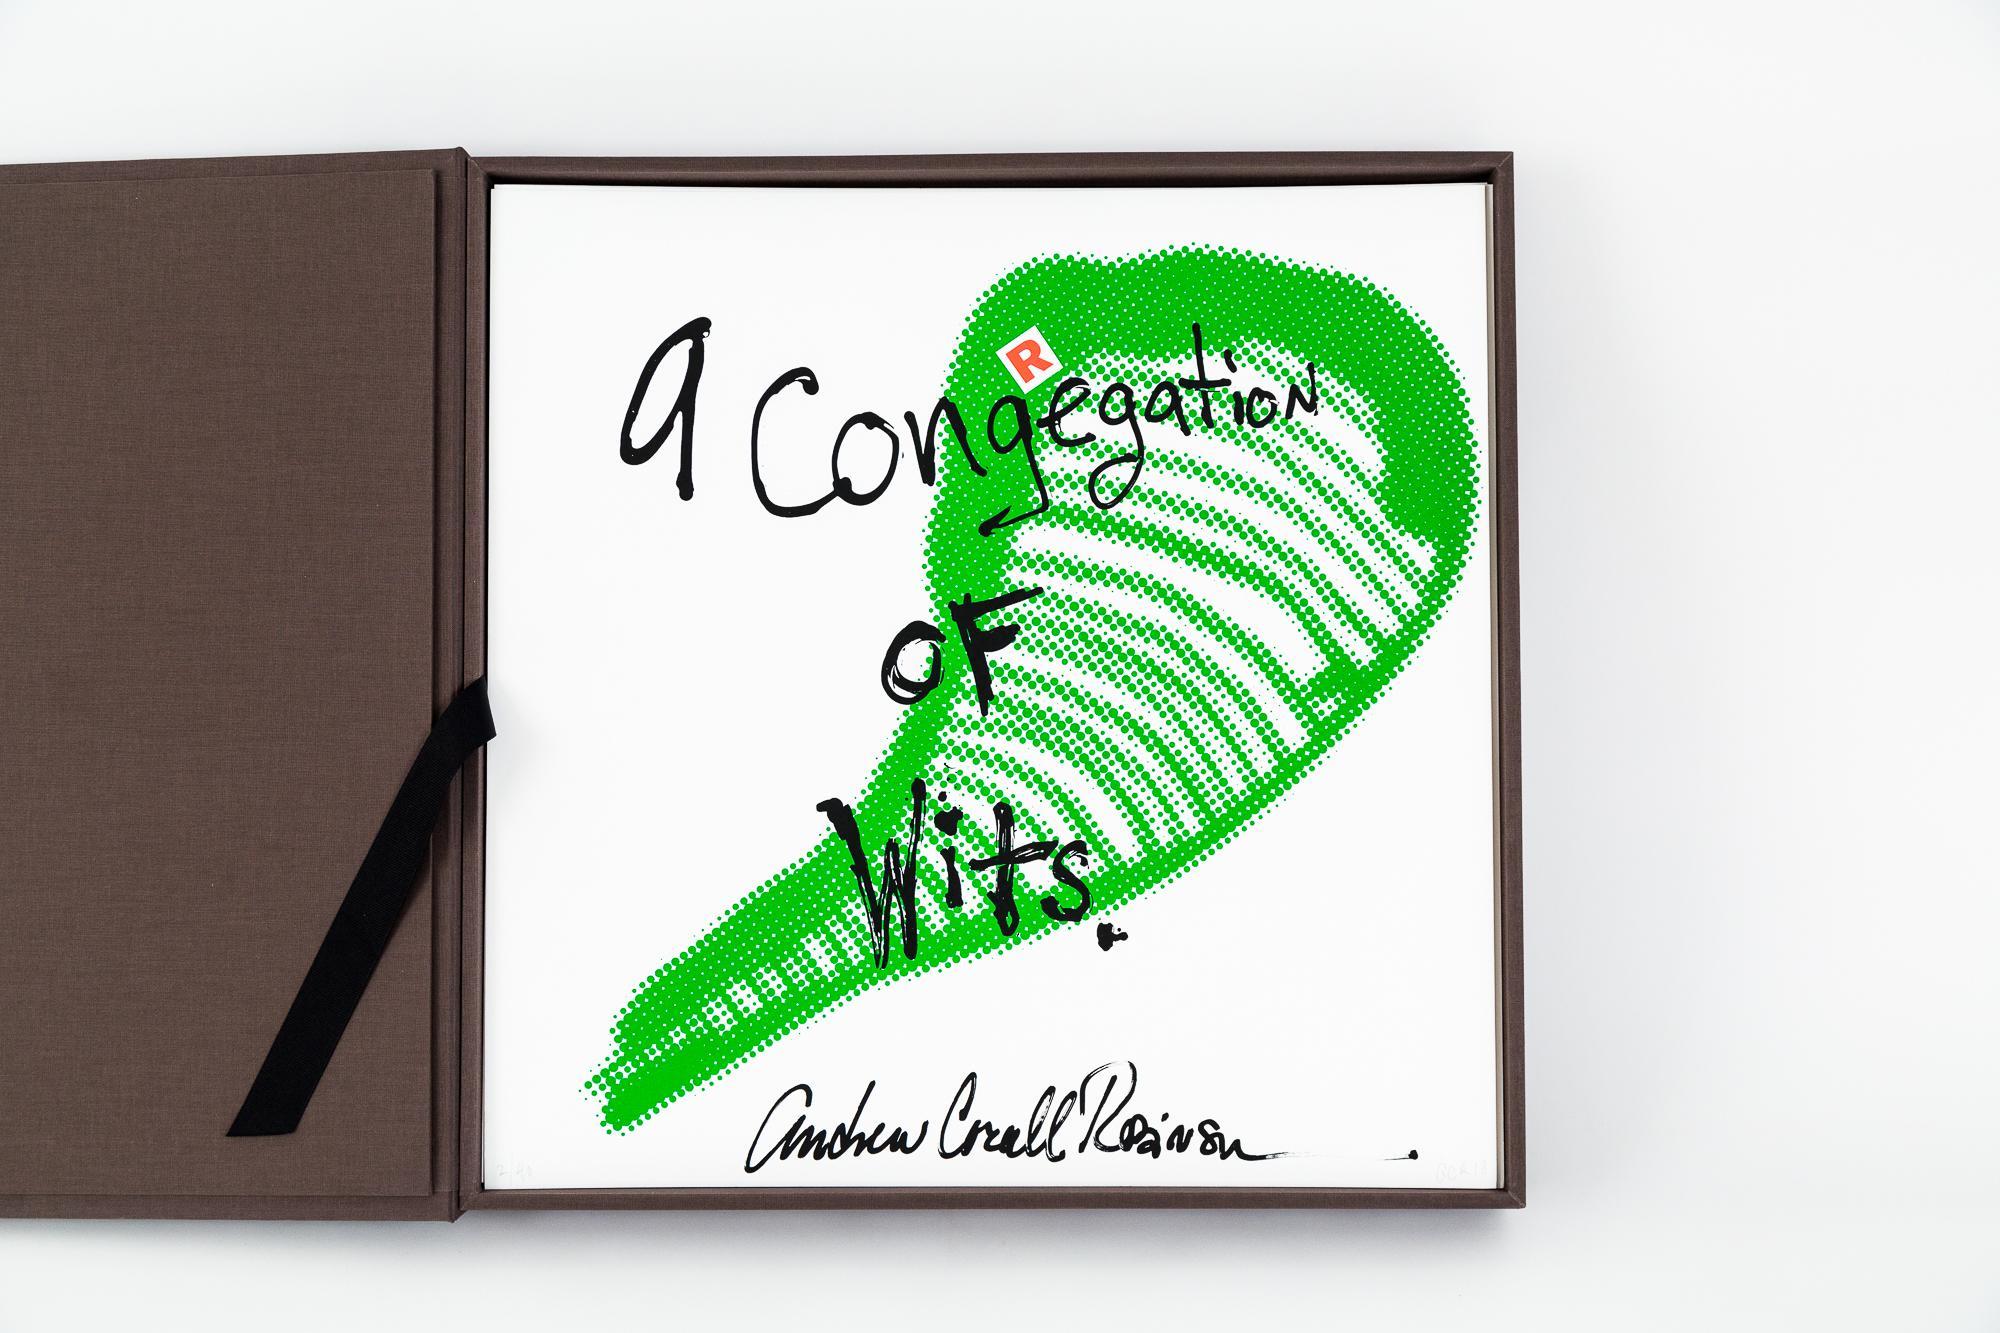 """CONGREGATION OF WITS: BOX SET"", 41 silkscreen prints, double-sided, custom box"